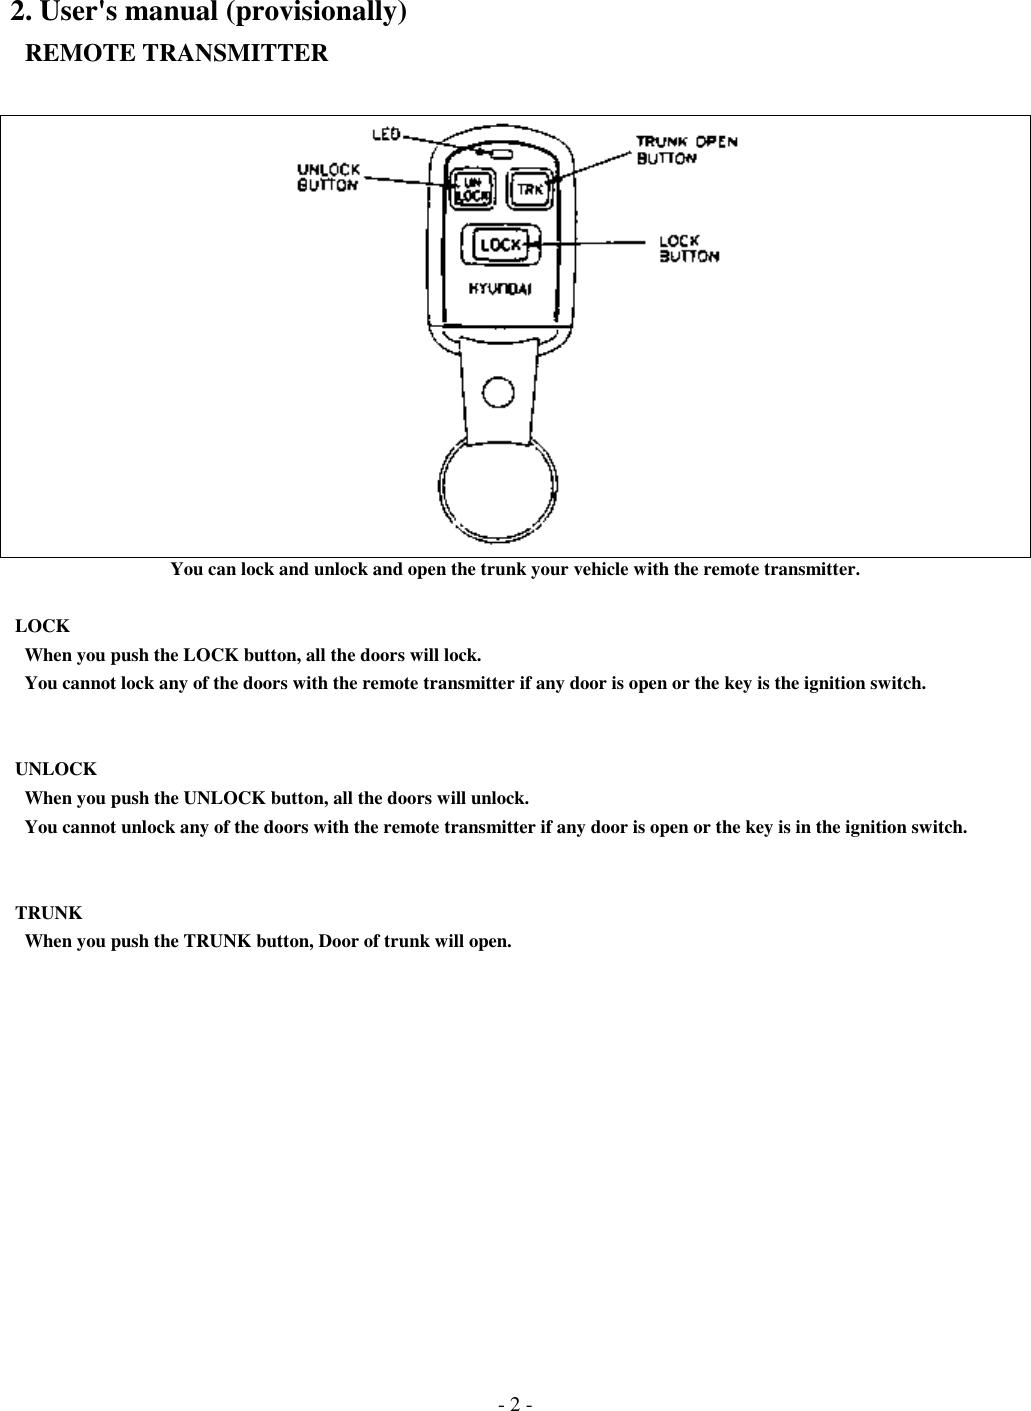 Omron Automotive Electronics Korea Oka 220t Rf Keyless Entry System Block Diagram Key 2 Useraposs Manual Provisionally Remote Transmitteryou Can Lock